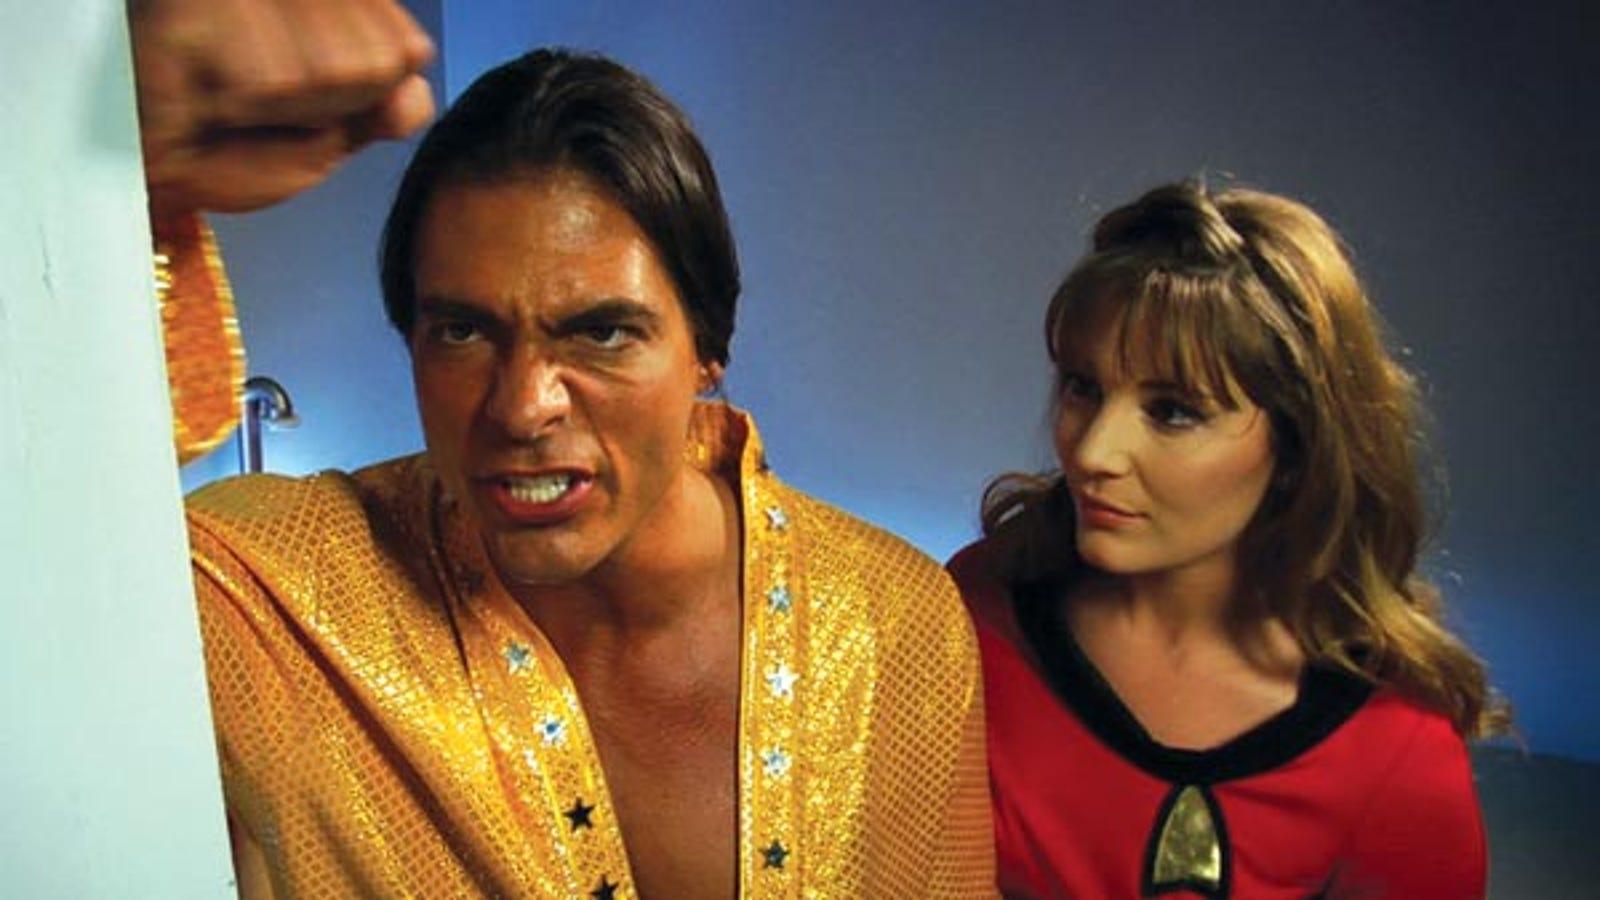 bol.com | This AinT Star Trek 2 Xxx (Dvd), Evan Stone | Dvds